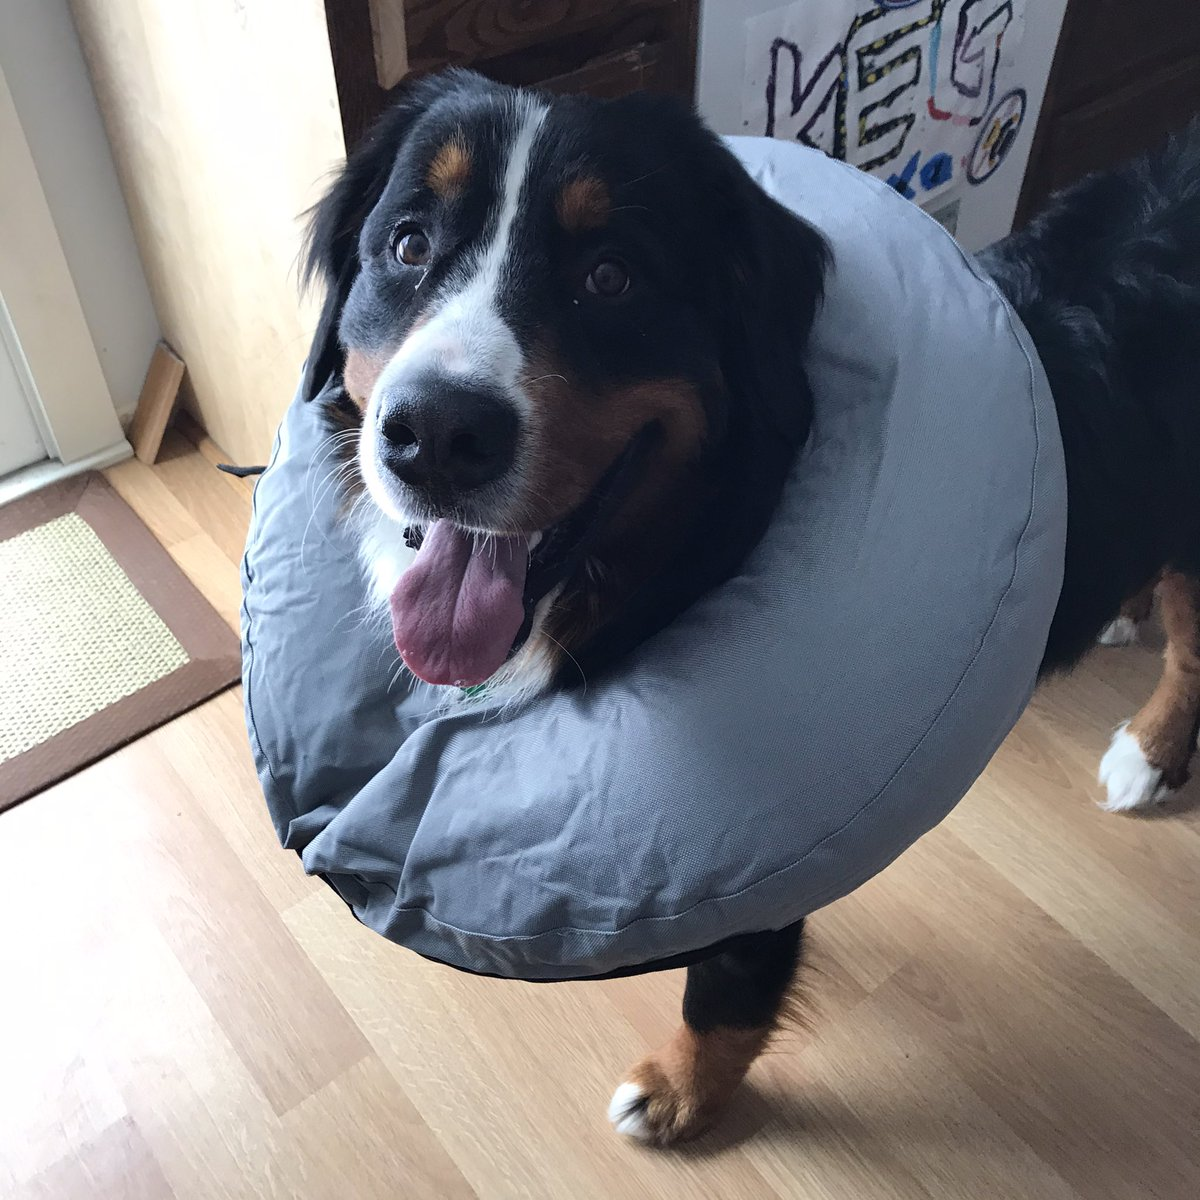 My furry dude is happy now with this inflatable collar. Thanks @Petco! #bernesemountaindog pic.twitter.com/mj7sfm9PYa